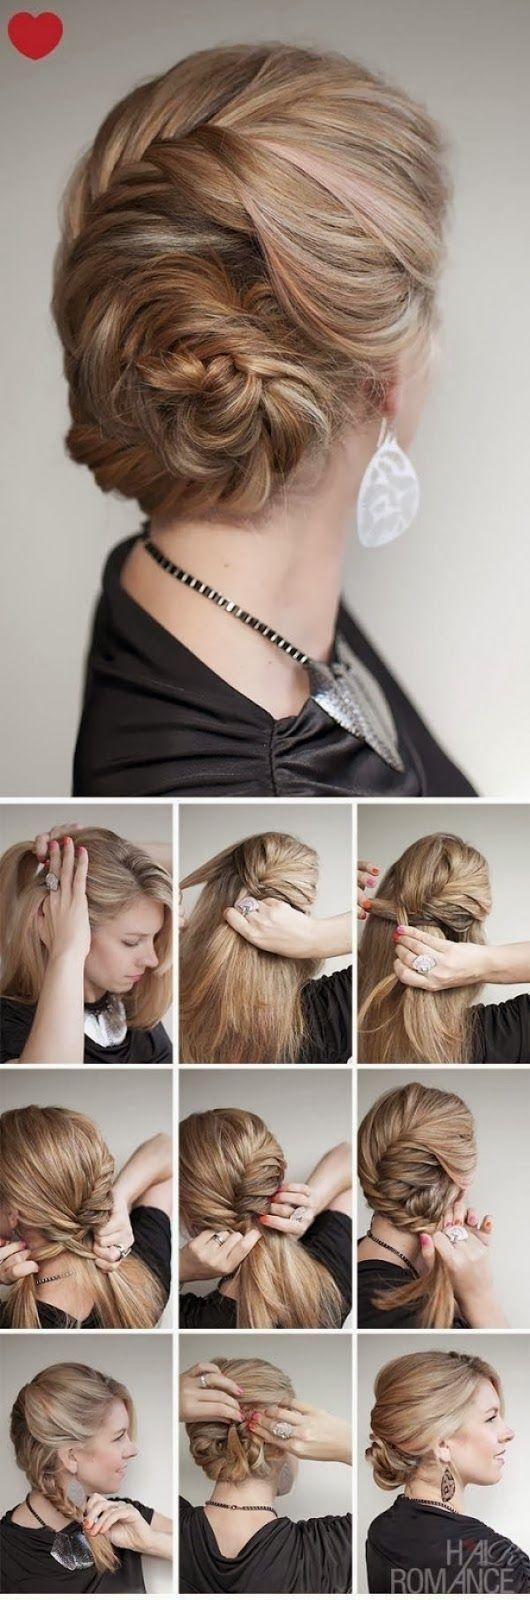 Hair Styles Tutorials. Re-pin if you like. Via Inweddingdress.com #hairstyles